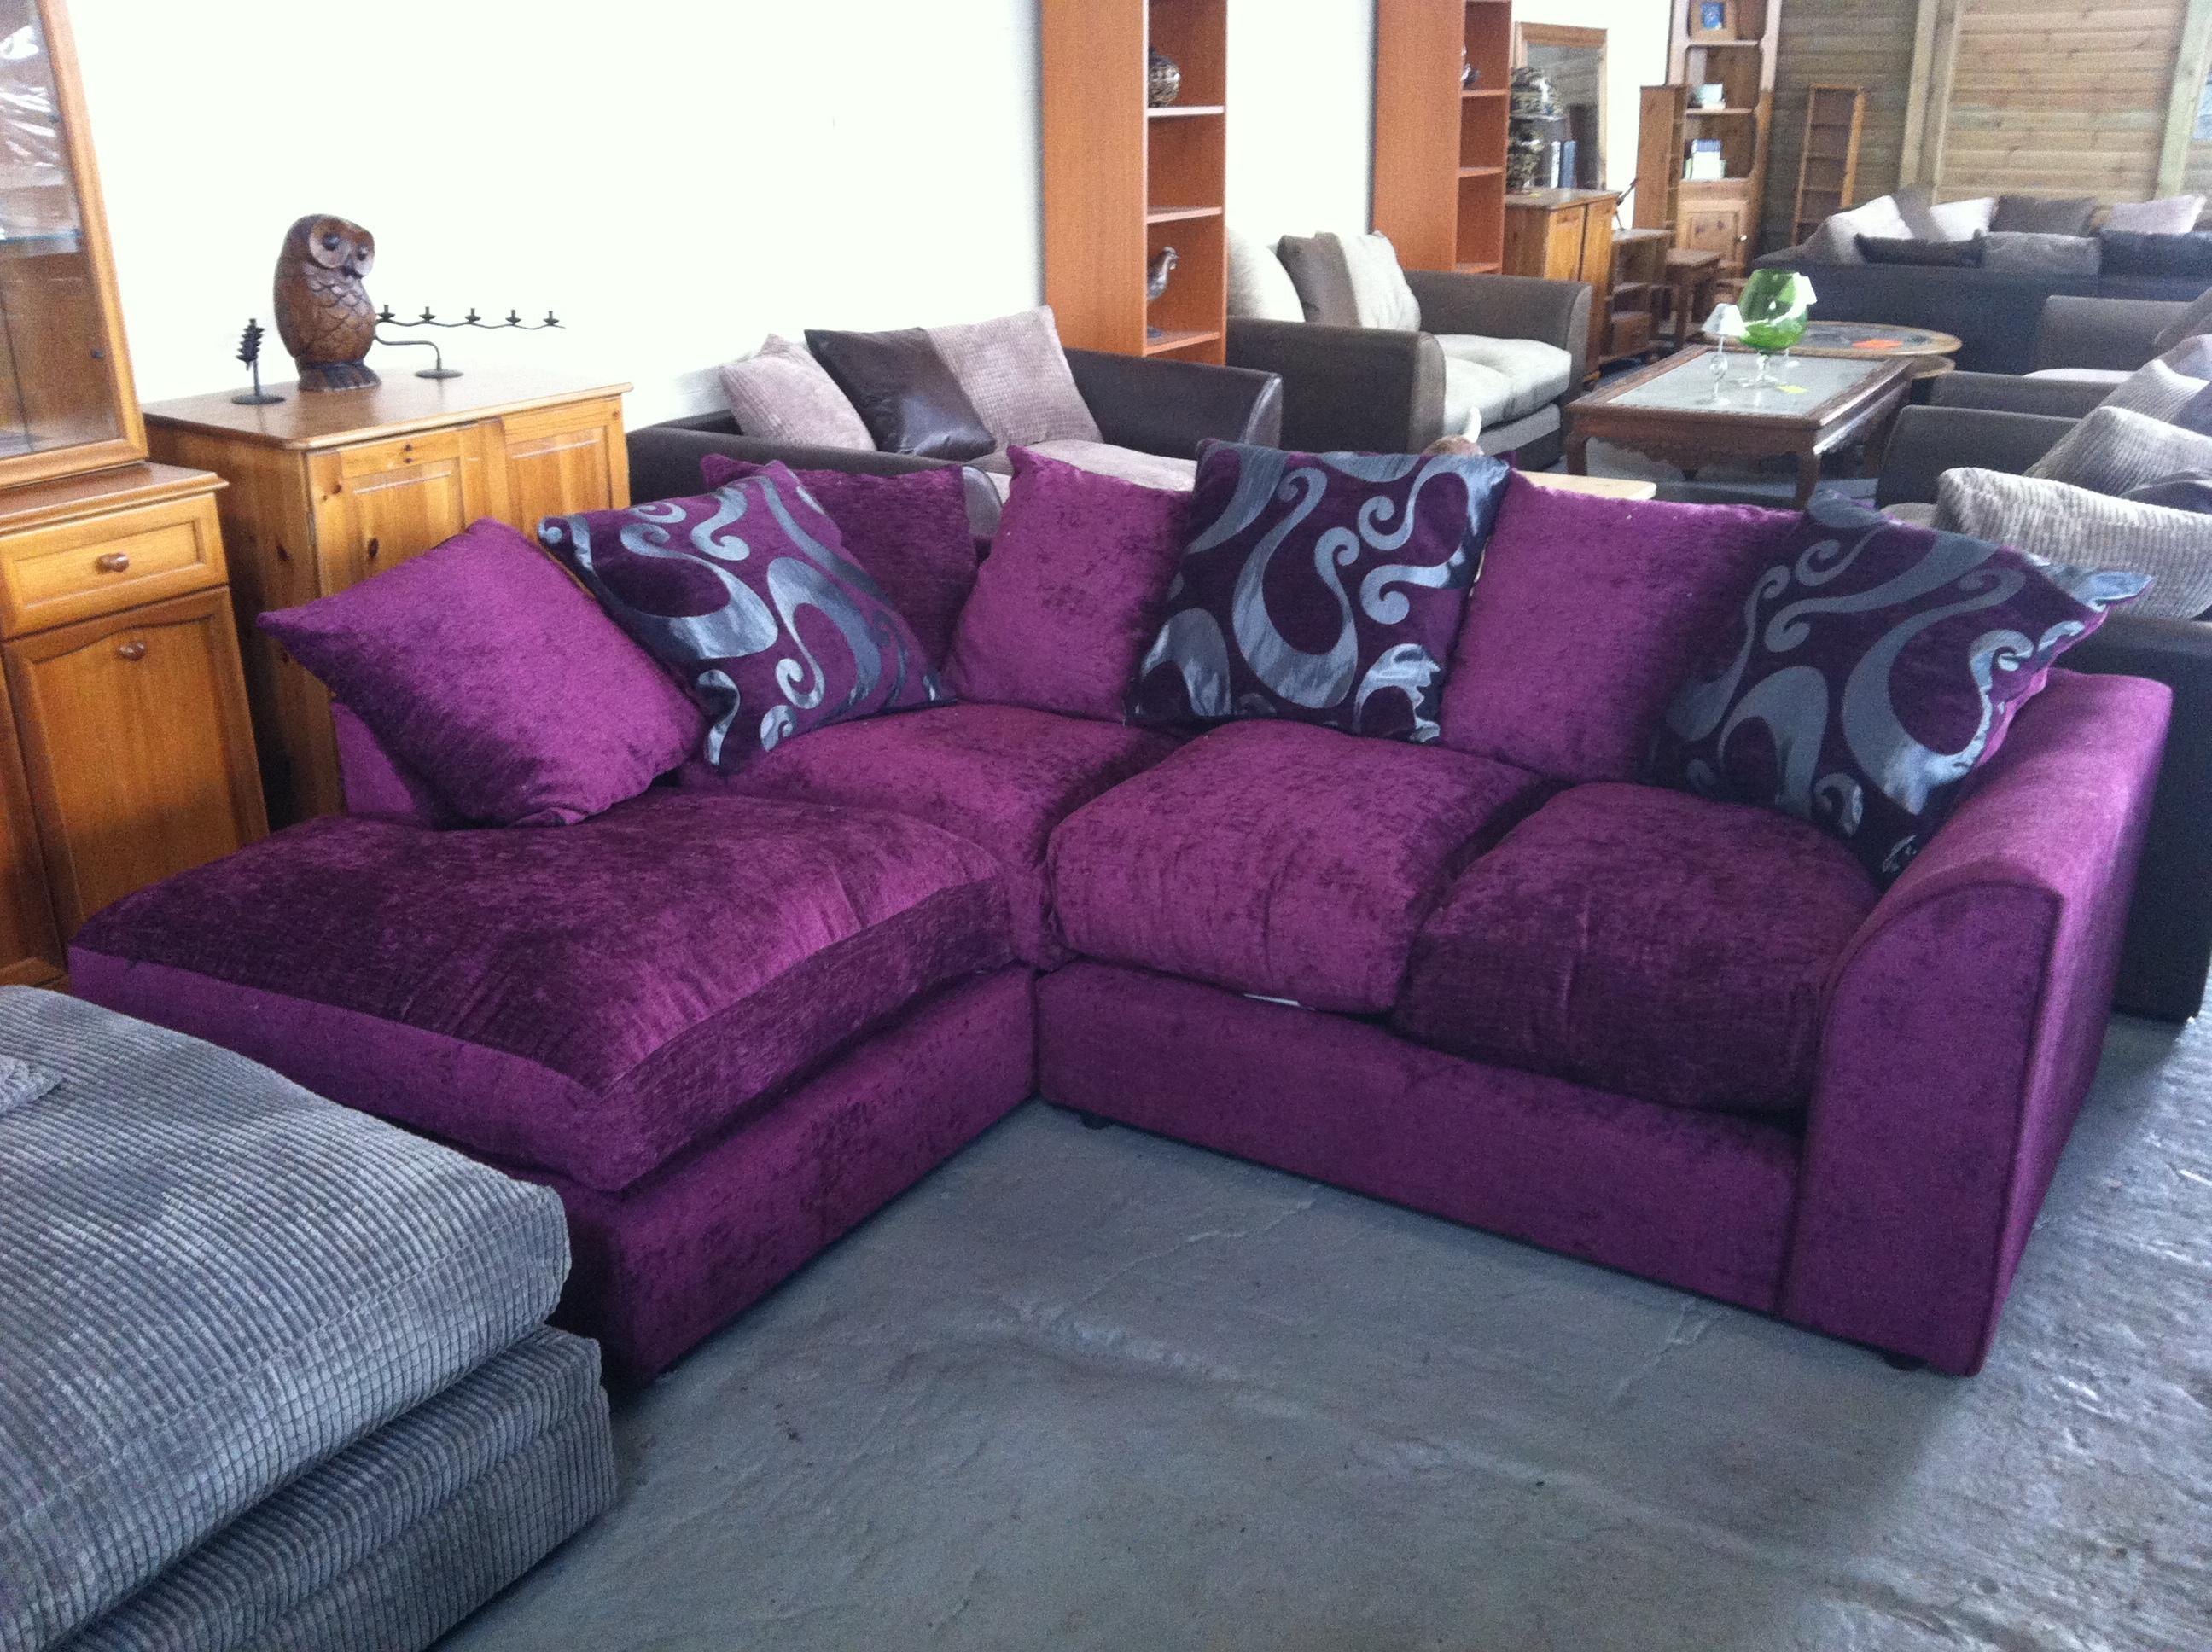 Purple Velvet Sectional Sofa | Tehranmix Decoration With Regard To Velvet Purple Sofas (View 5 of 20)